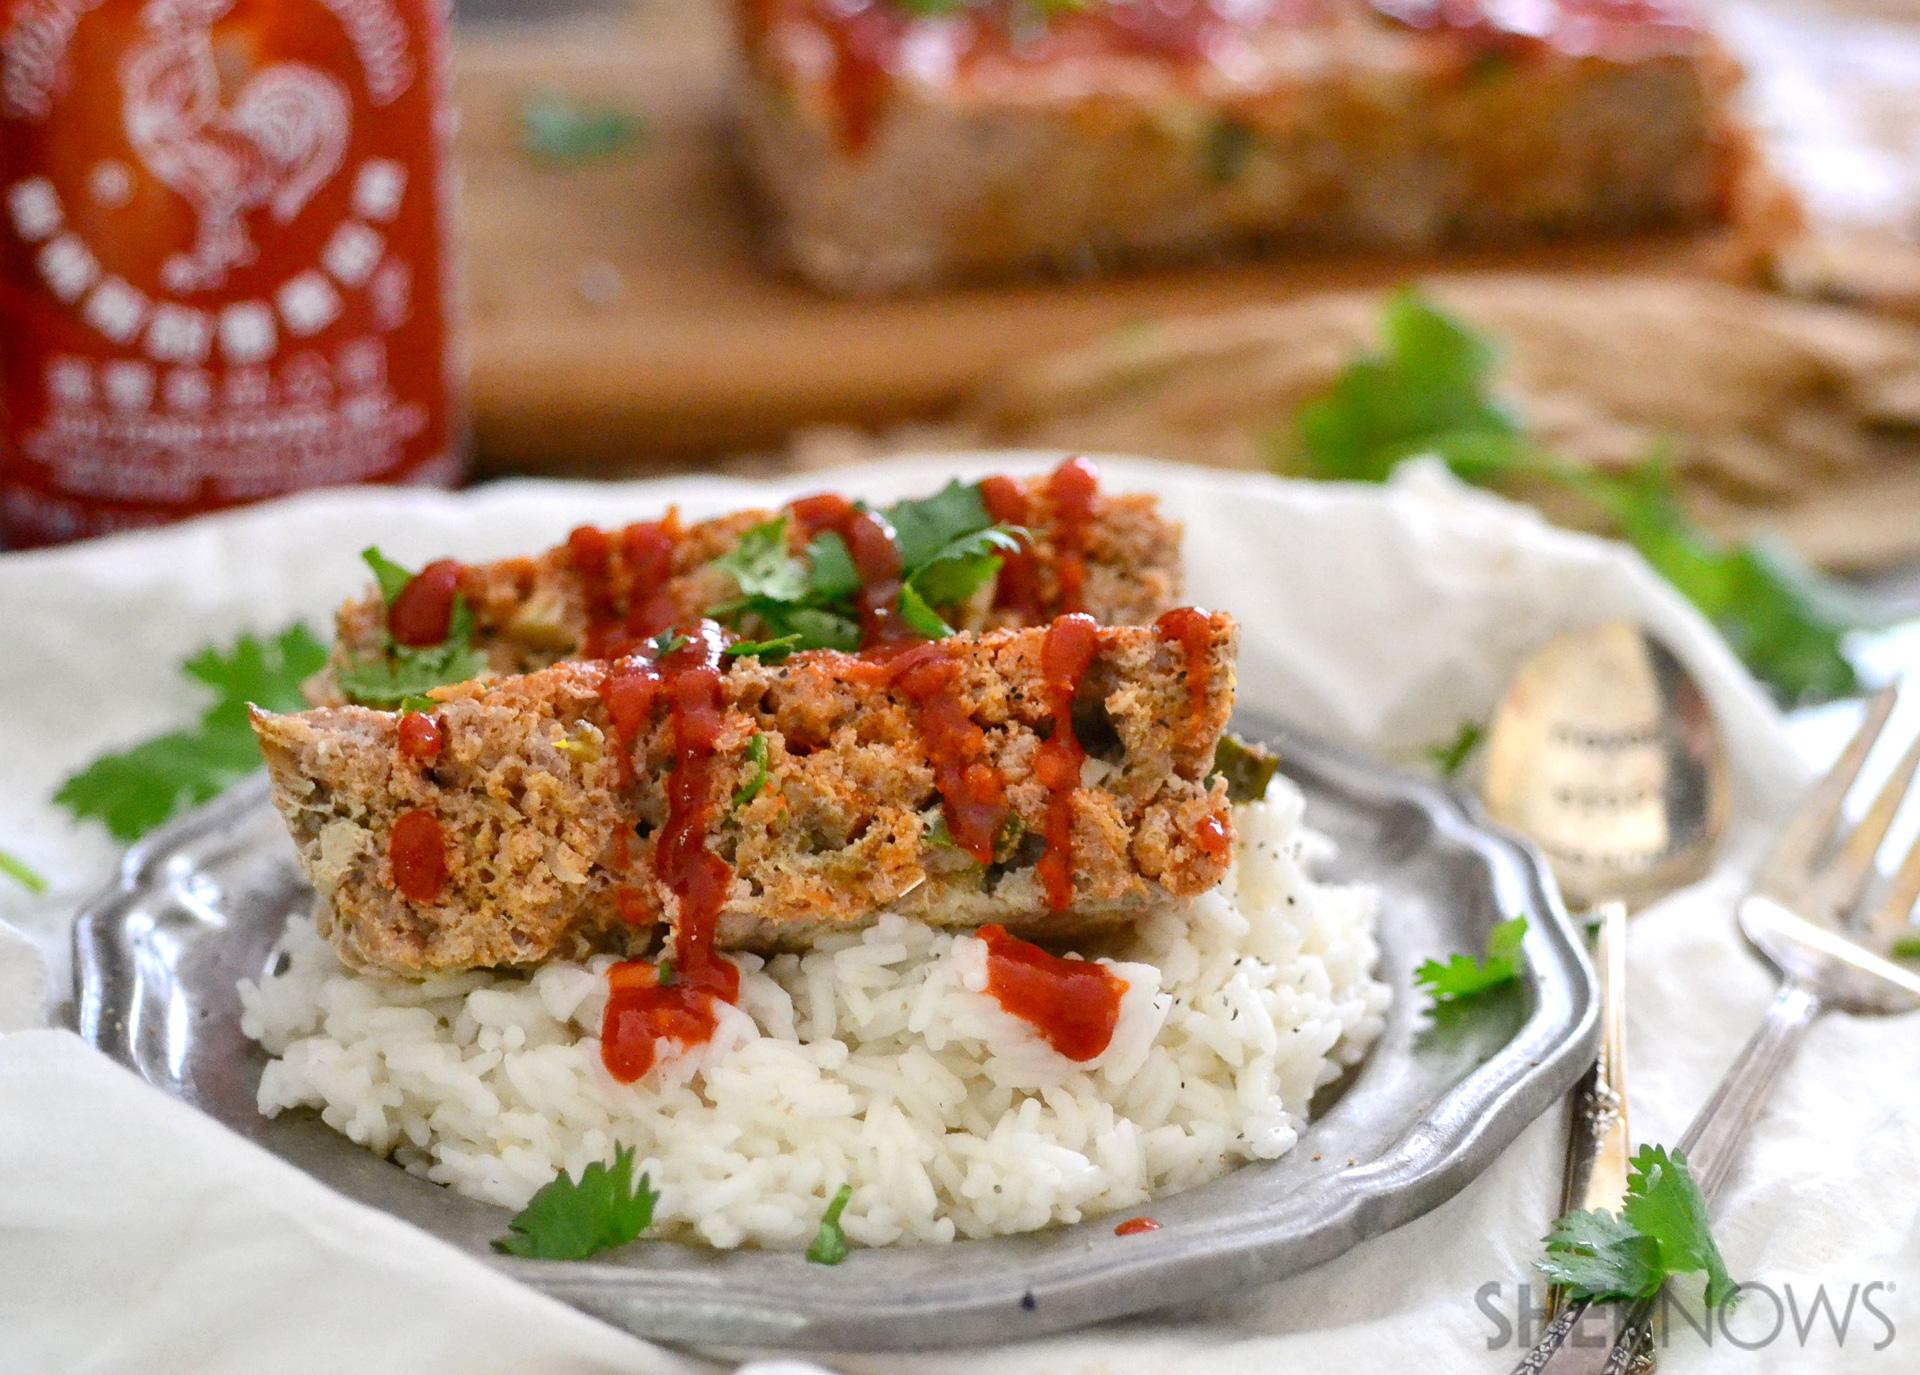 Thai spiced meatloaf